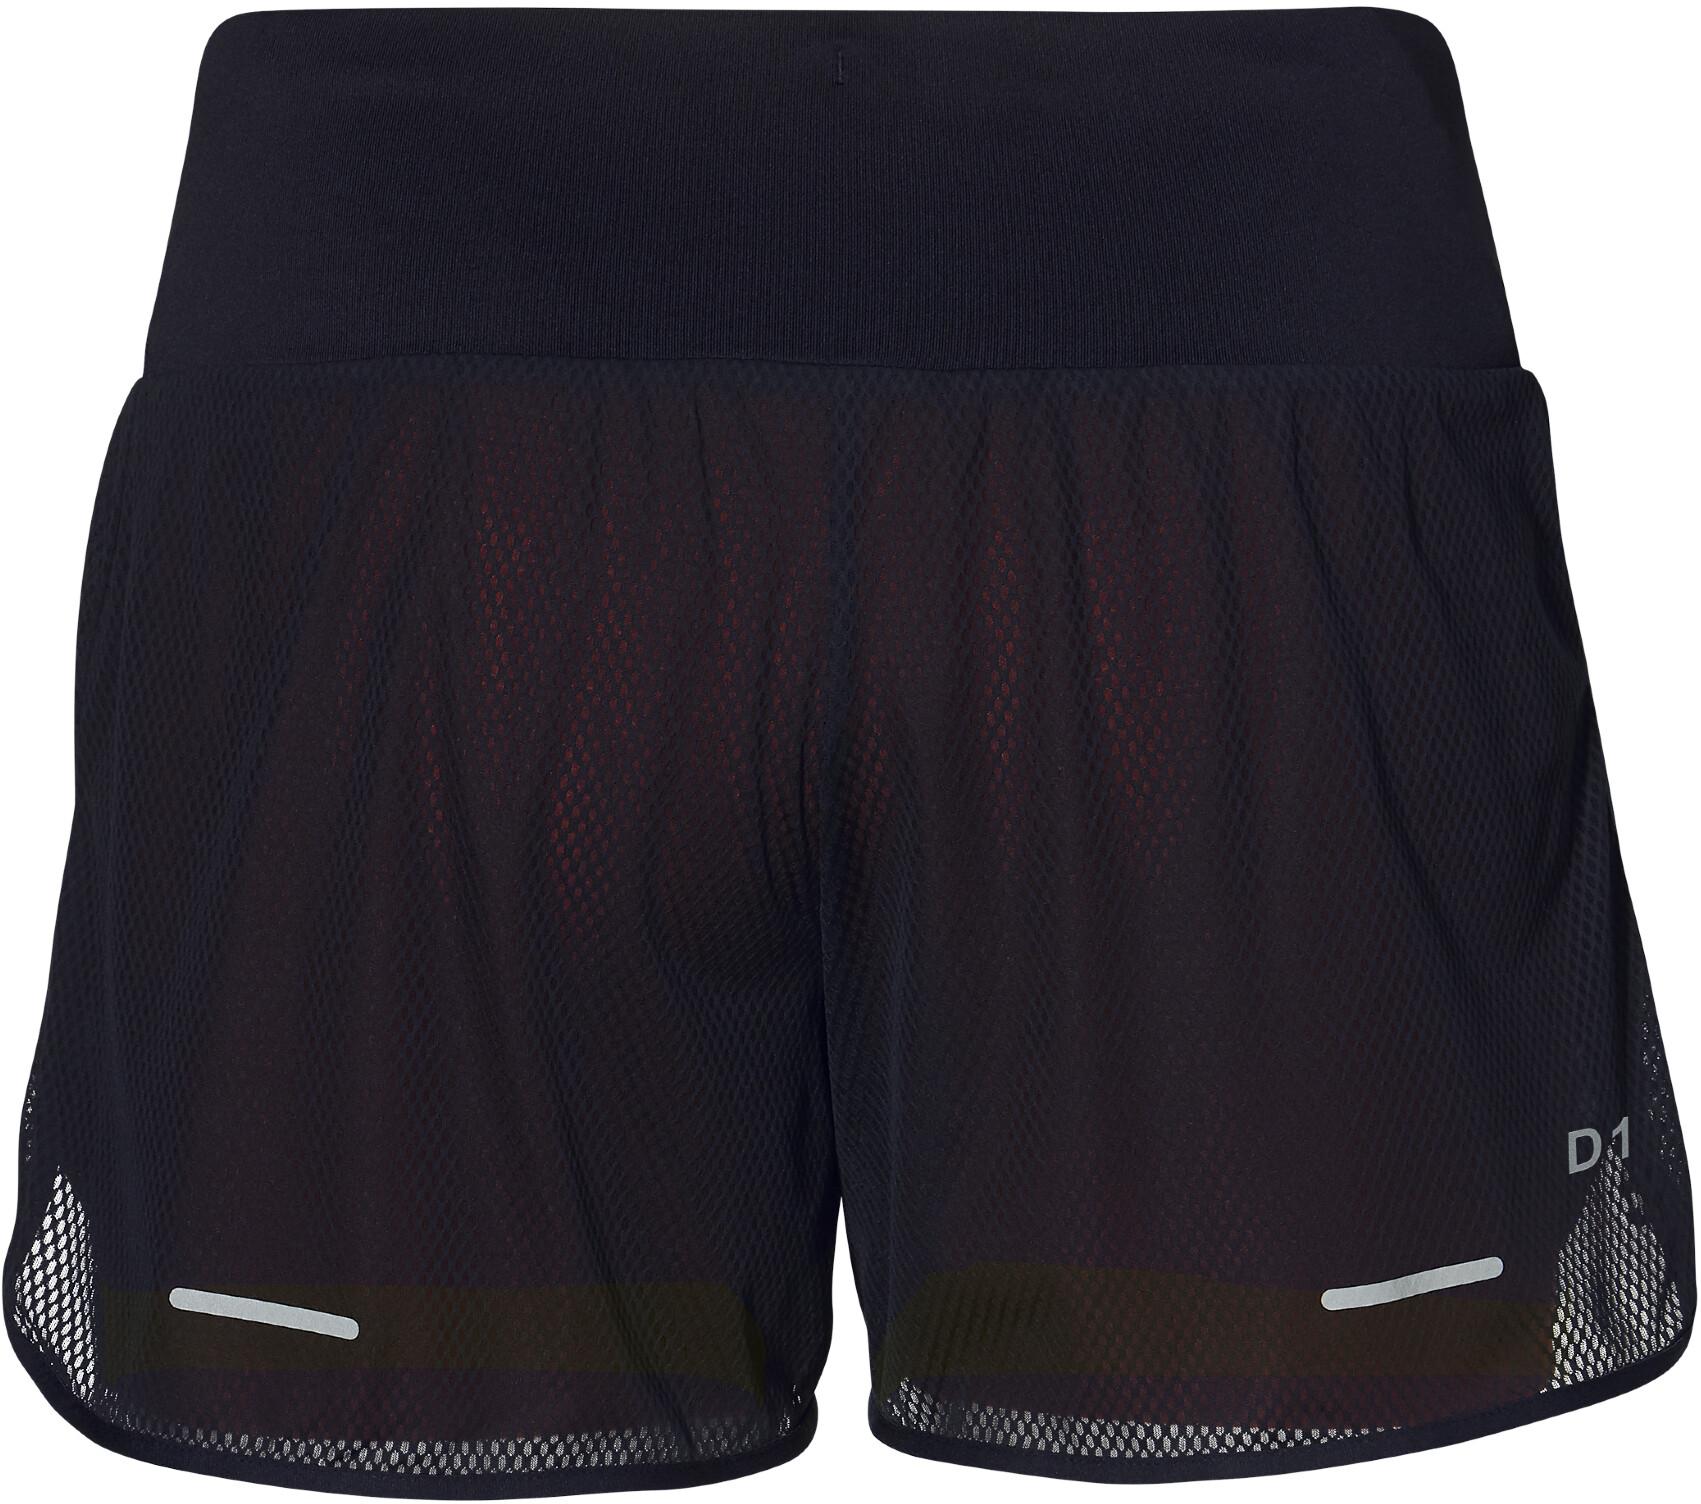 asics Cool 2 In 1 Shorts Women mp performance black